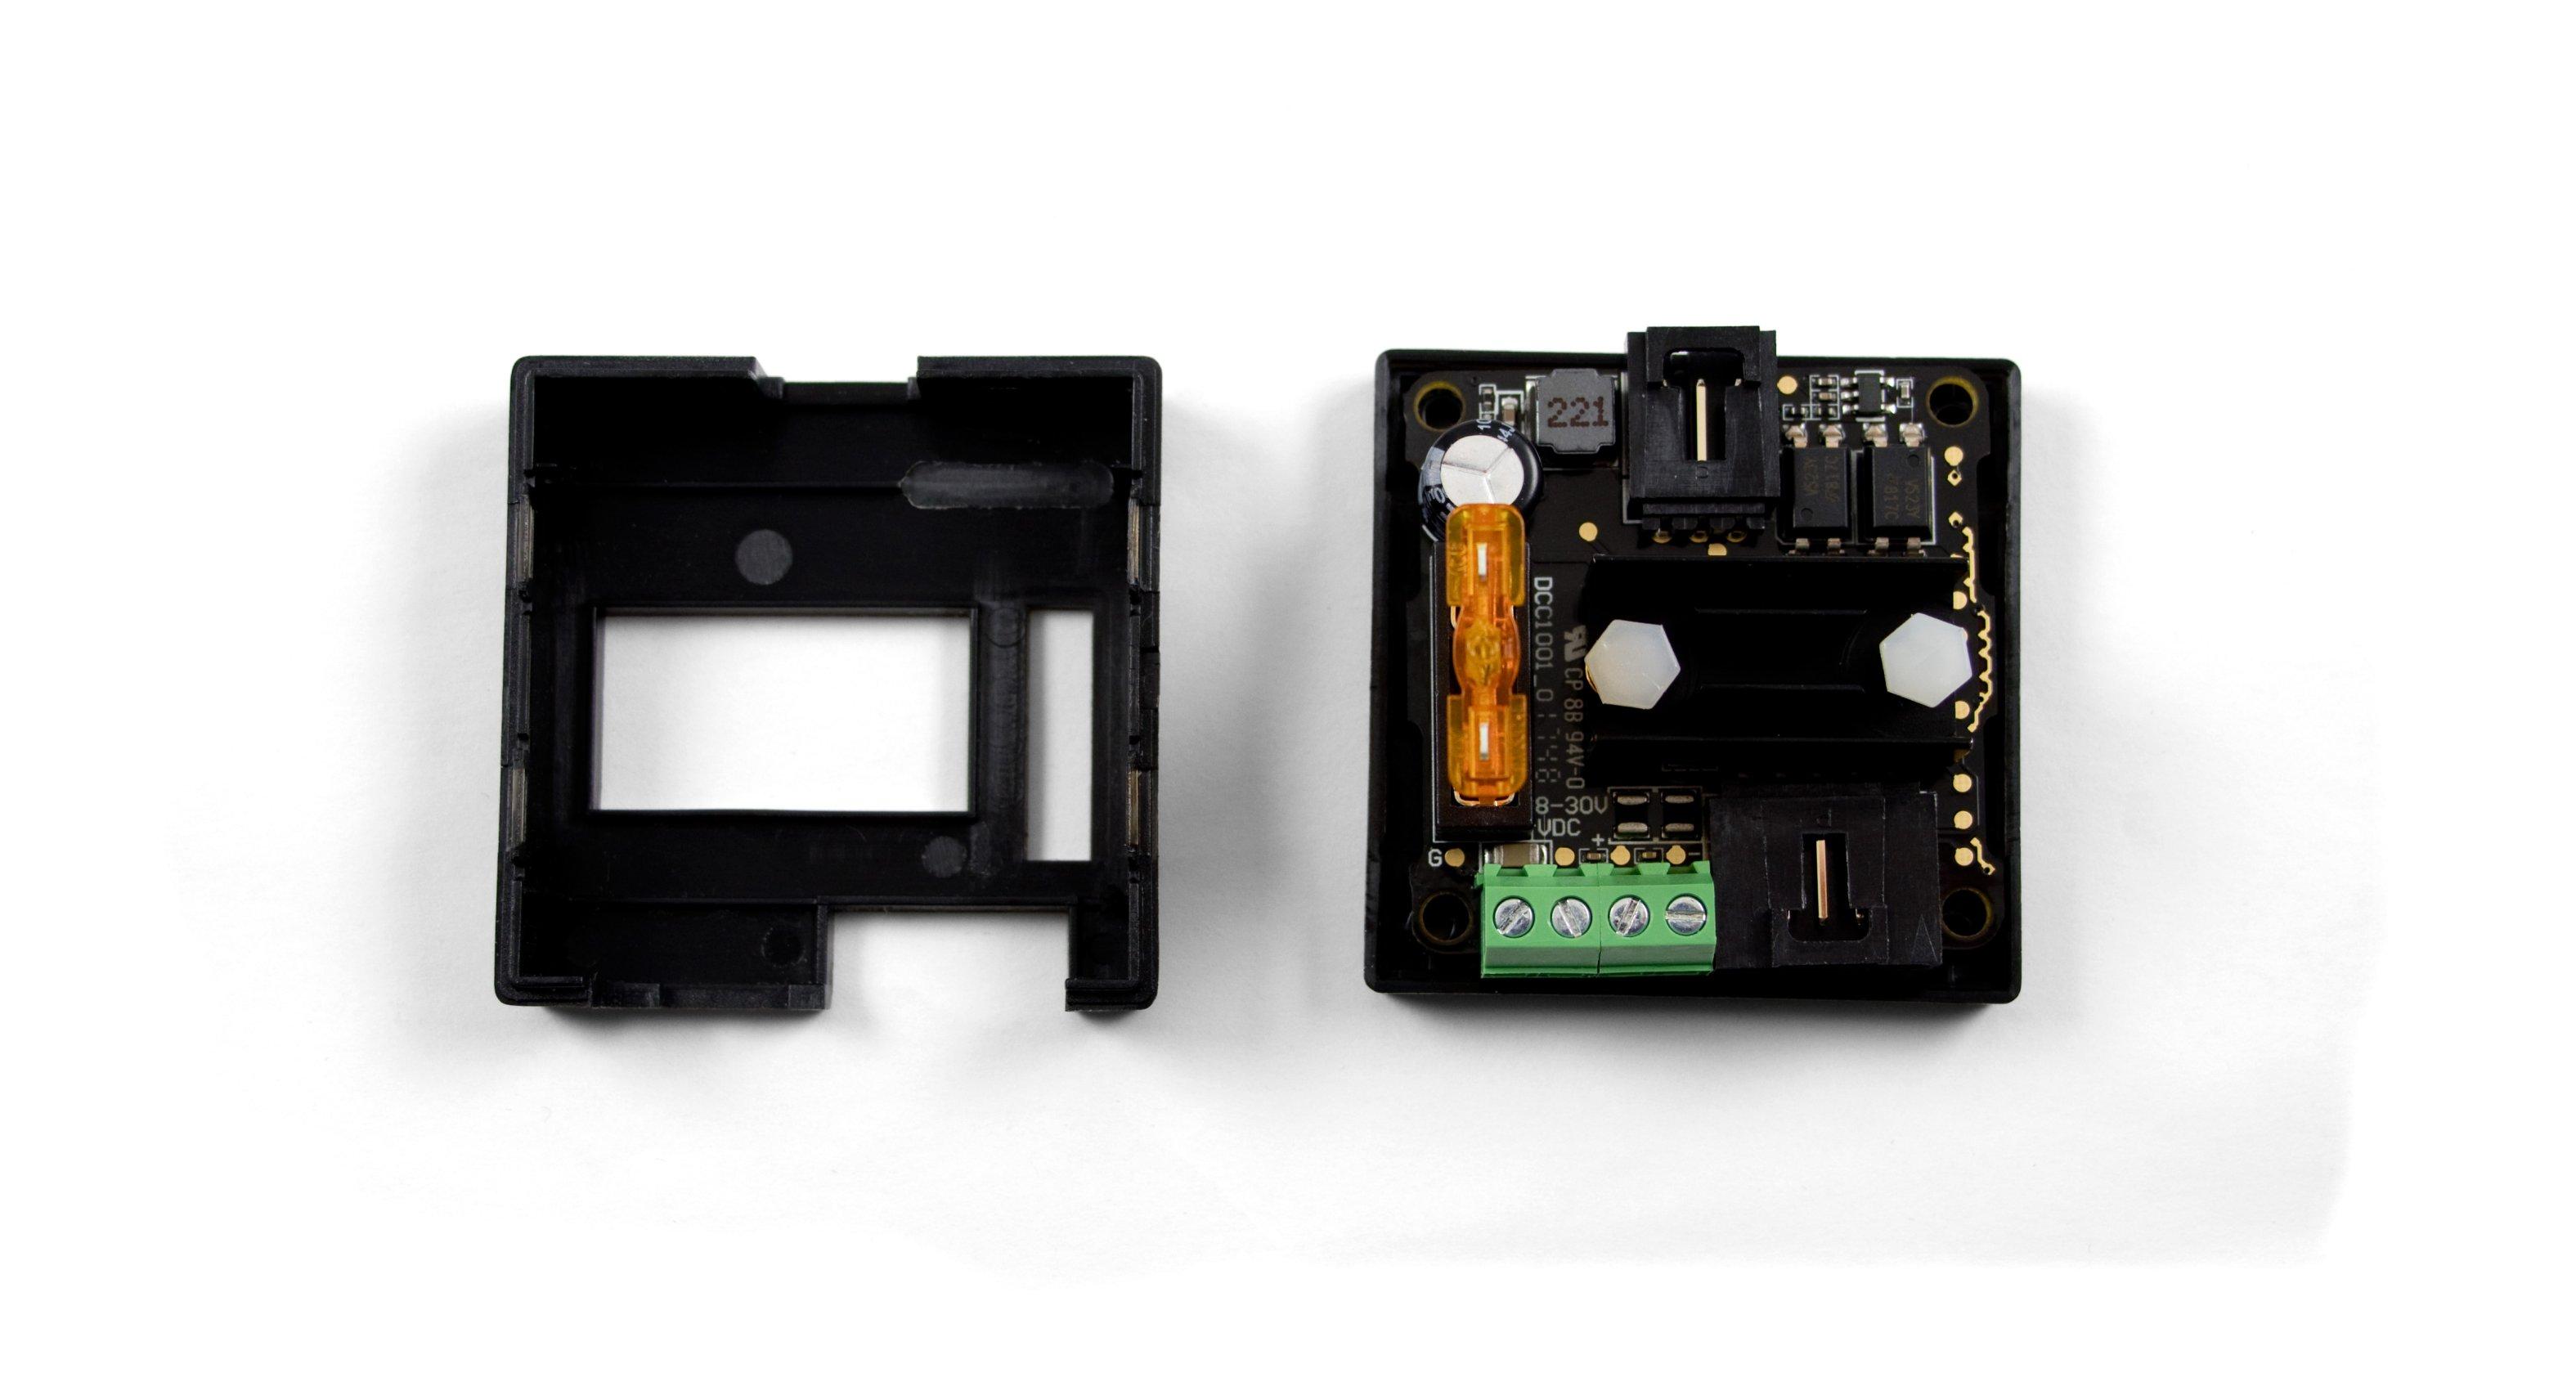 2a Dc Motor Phidget Dcc1001 0 At Phidgets Fan Starts To Rotate 40 C On The Heatsink Inside